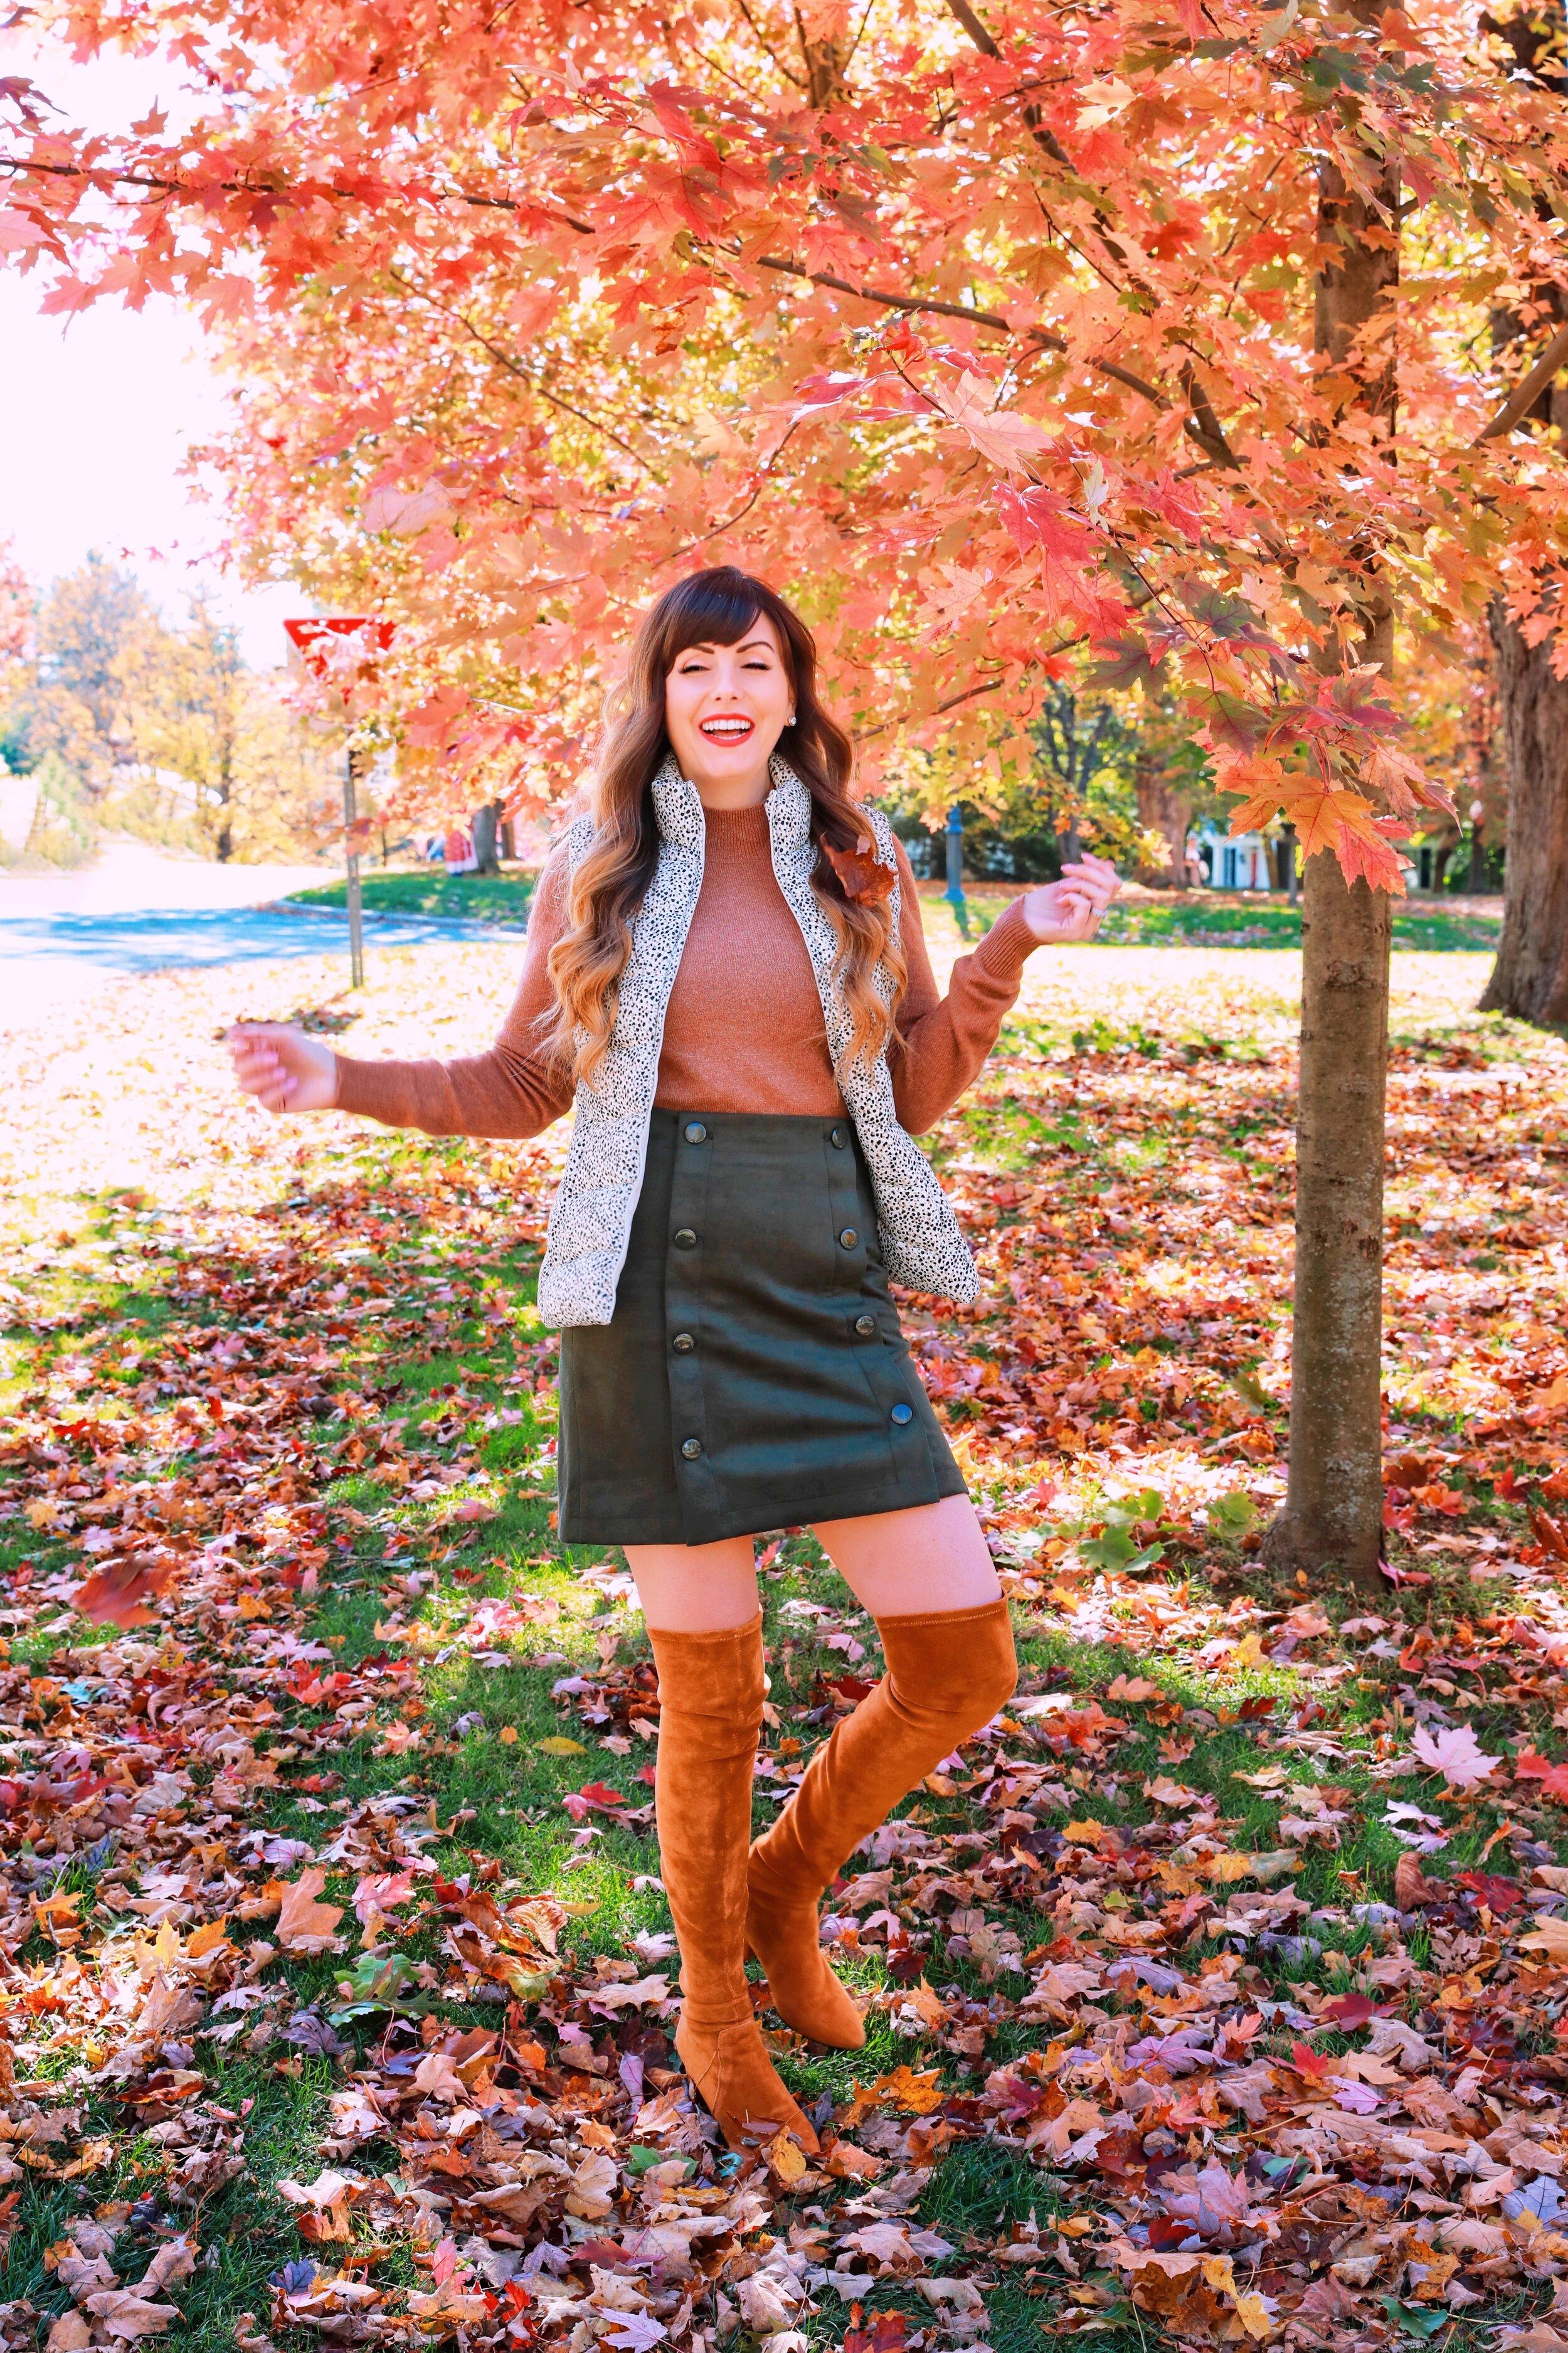 vermont fall foliage heaven.JPG